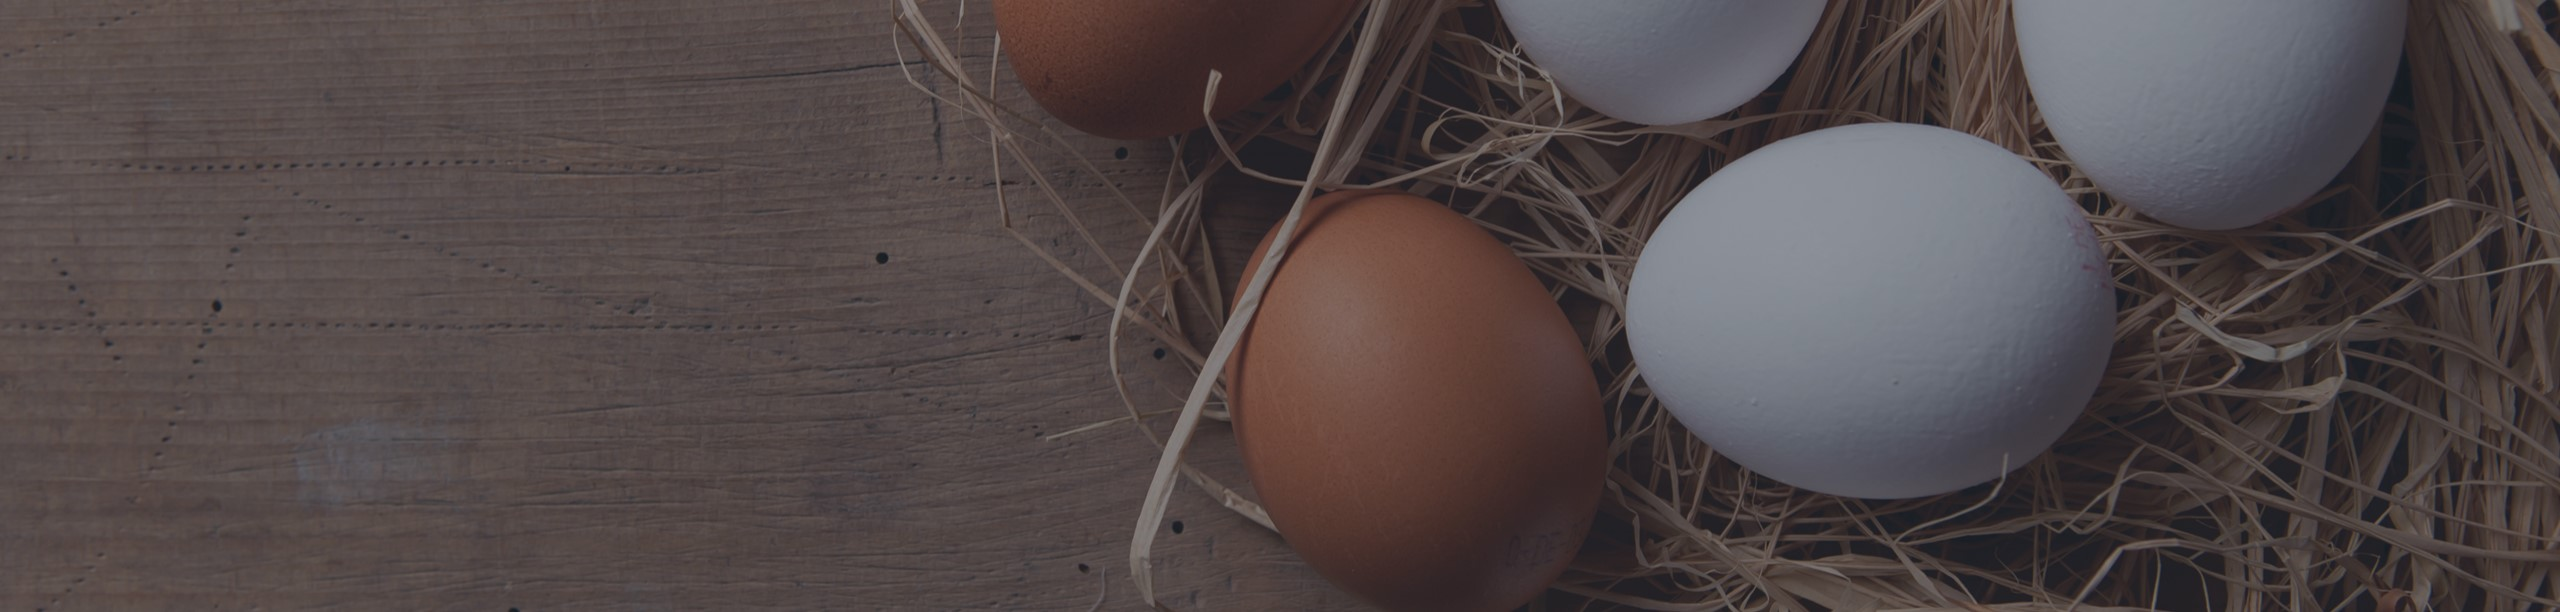 Eggs1-2